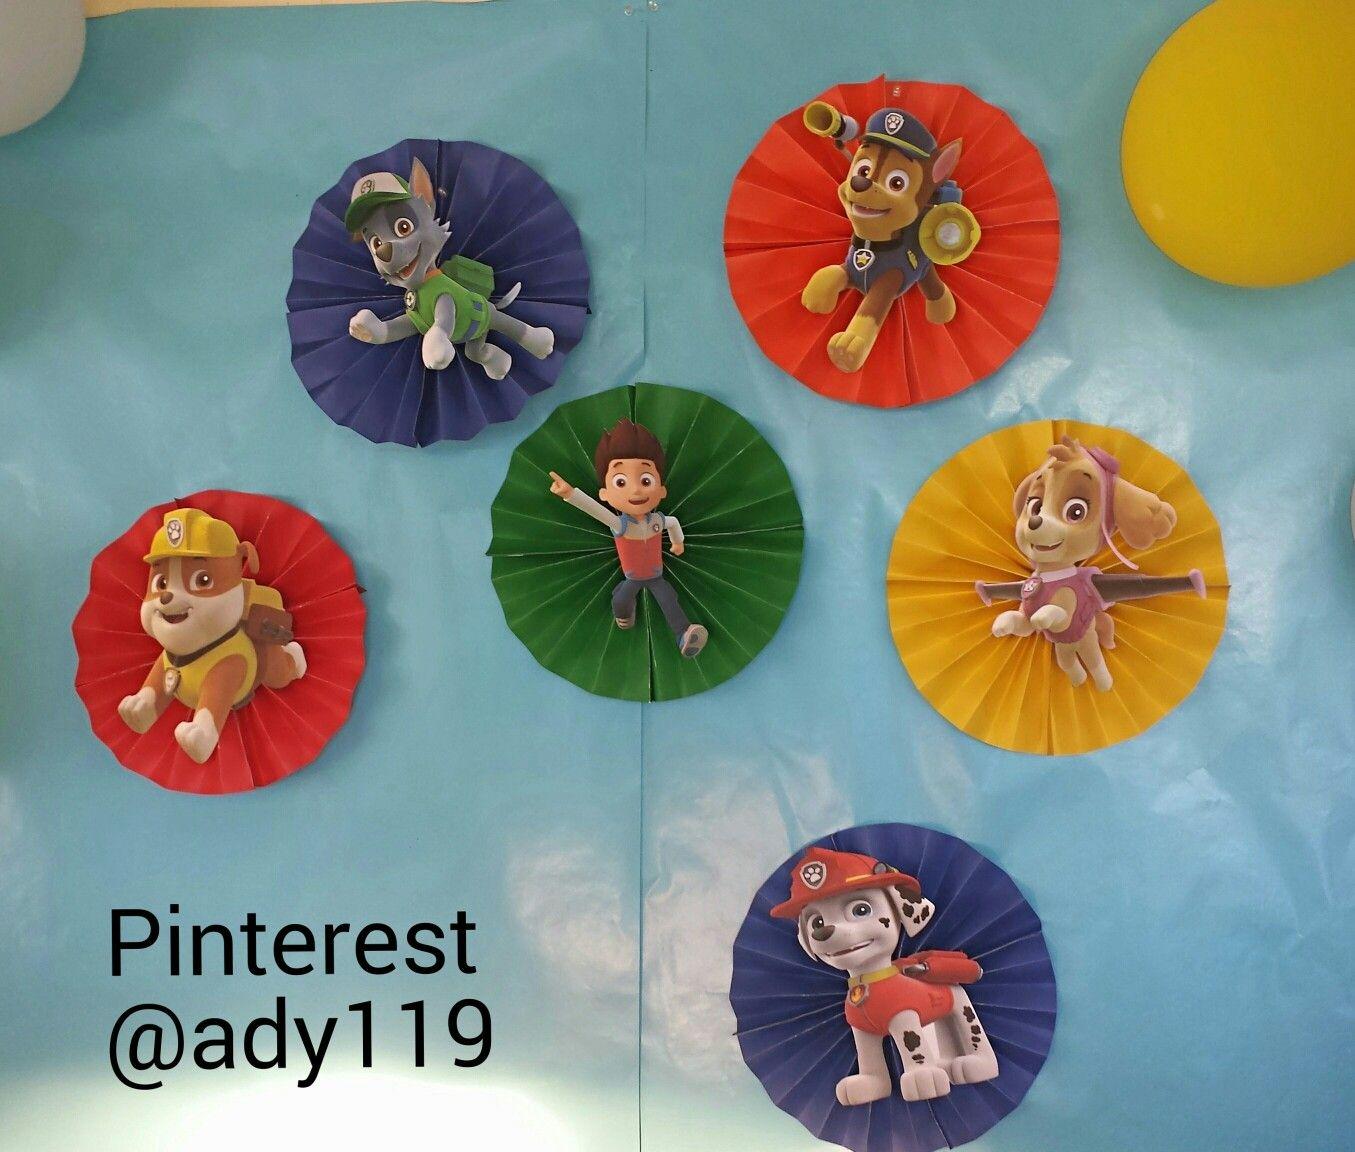 M 225 s de 1000 ideas sobre decoraciones de fiesta de safari en pinterest - Paw Patrol Backdrop Crafting Cover Paper Fans With Character Printouts On Card Stock 2